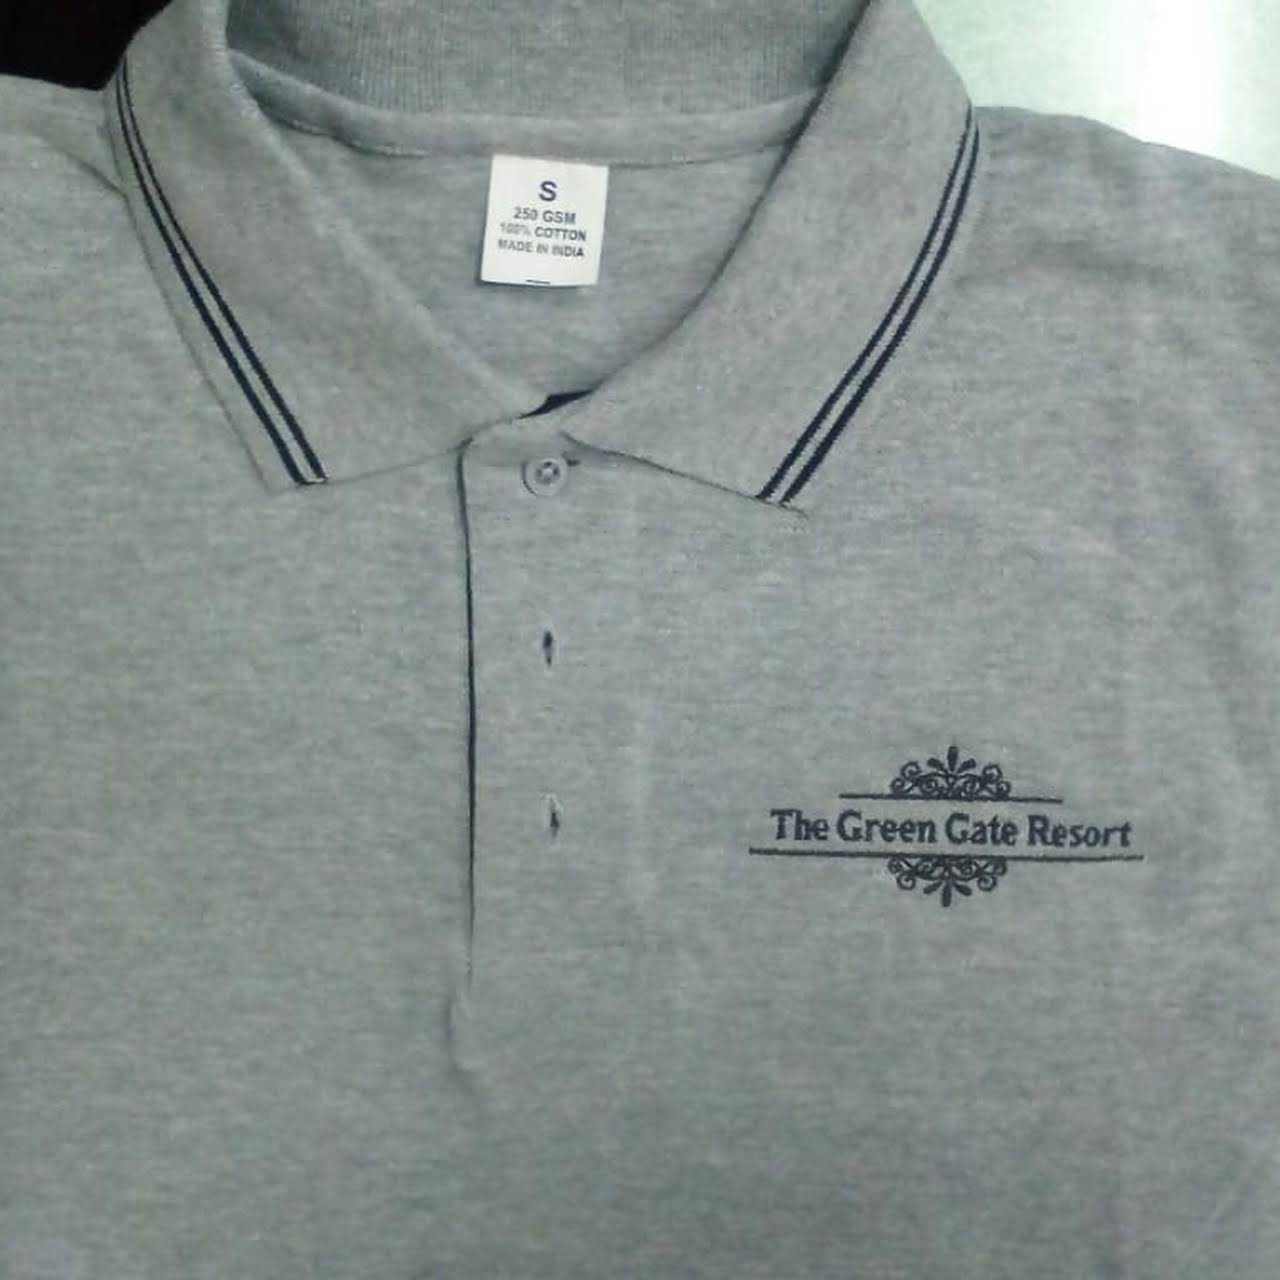 7f74b11ee t shirt manufacturers KPB Apparels. 100% Cotton. Ready Sto